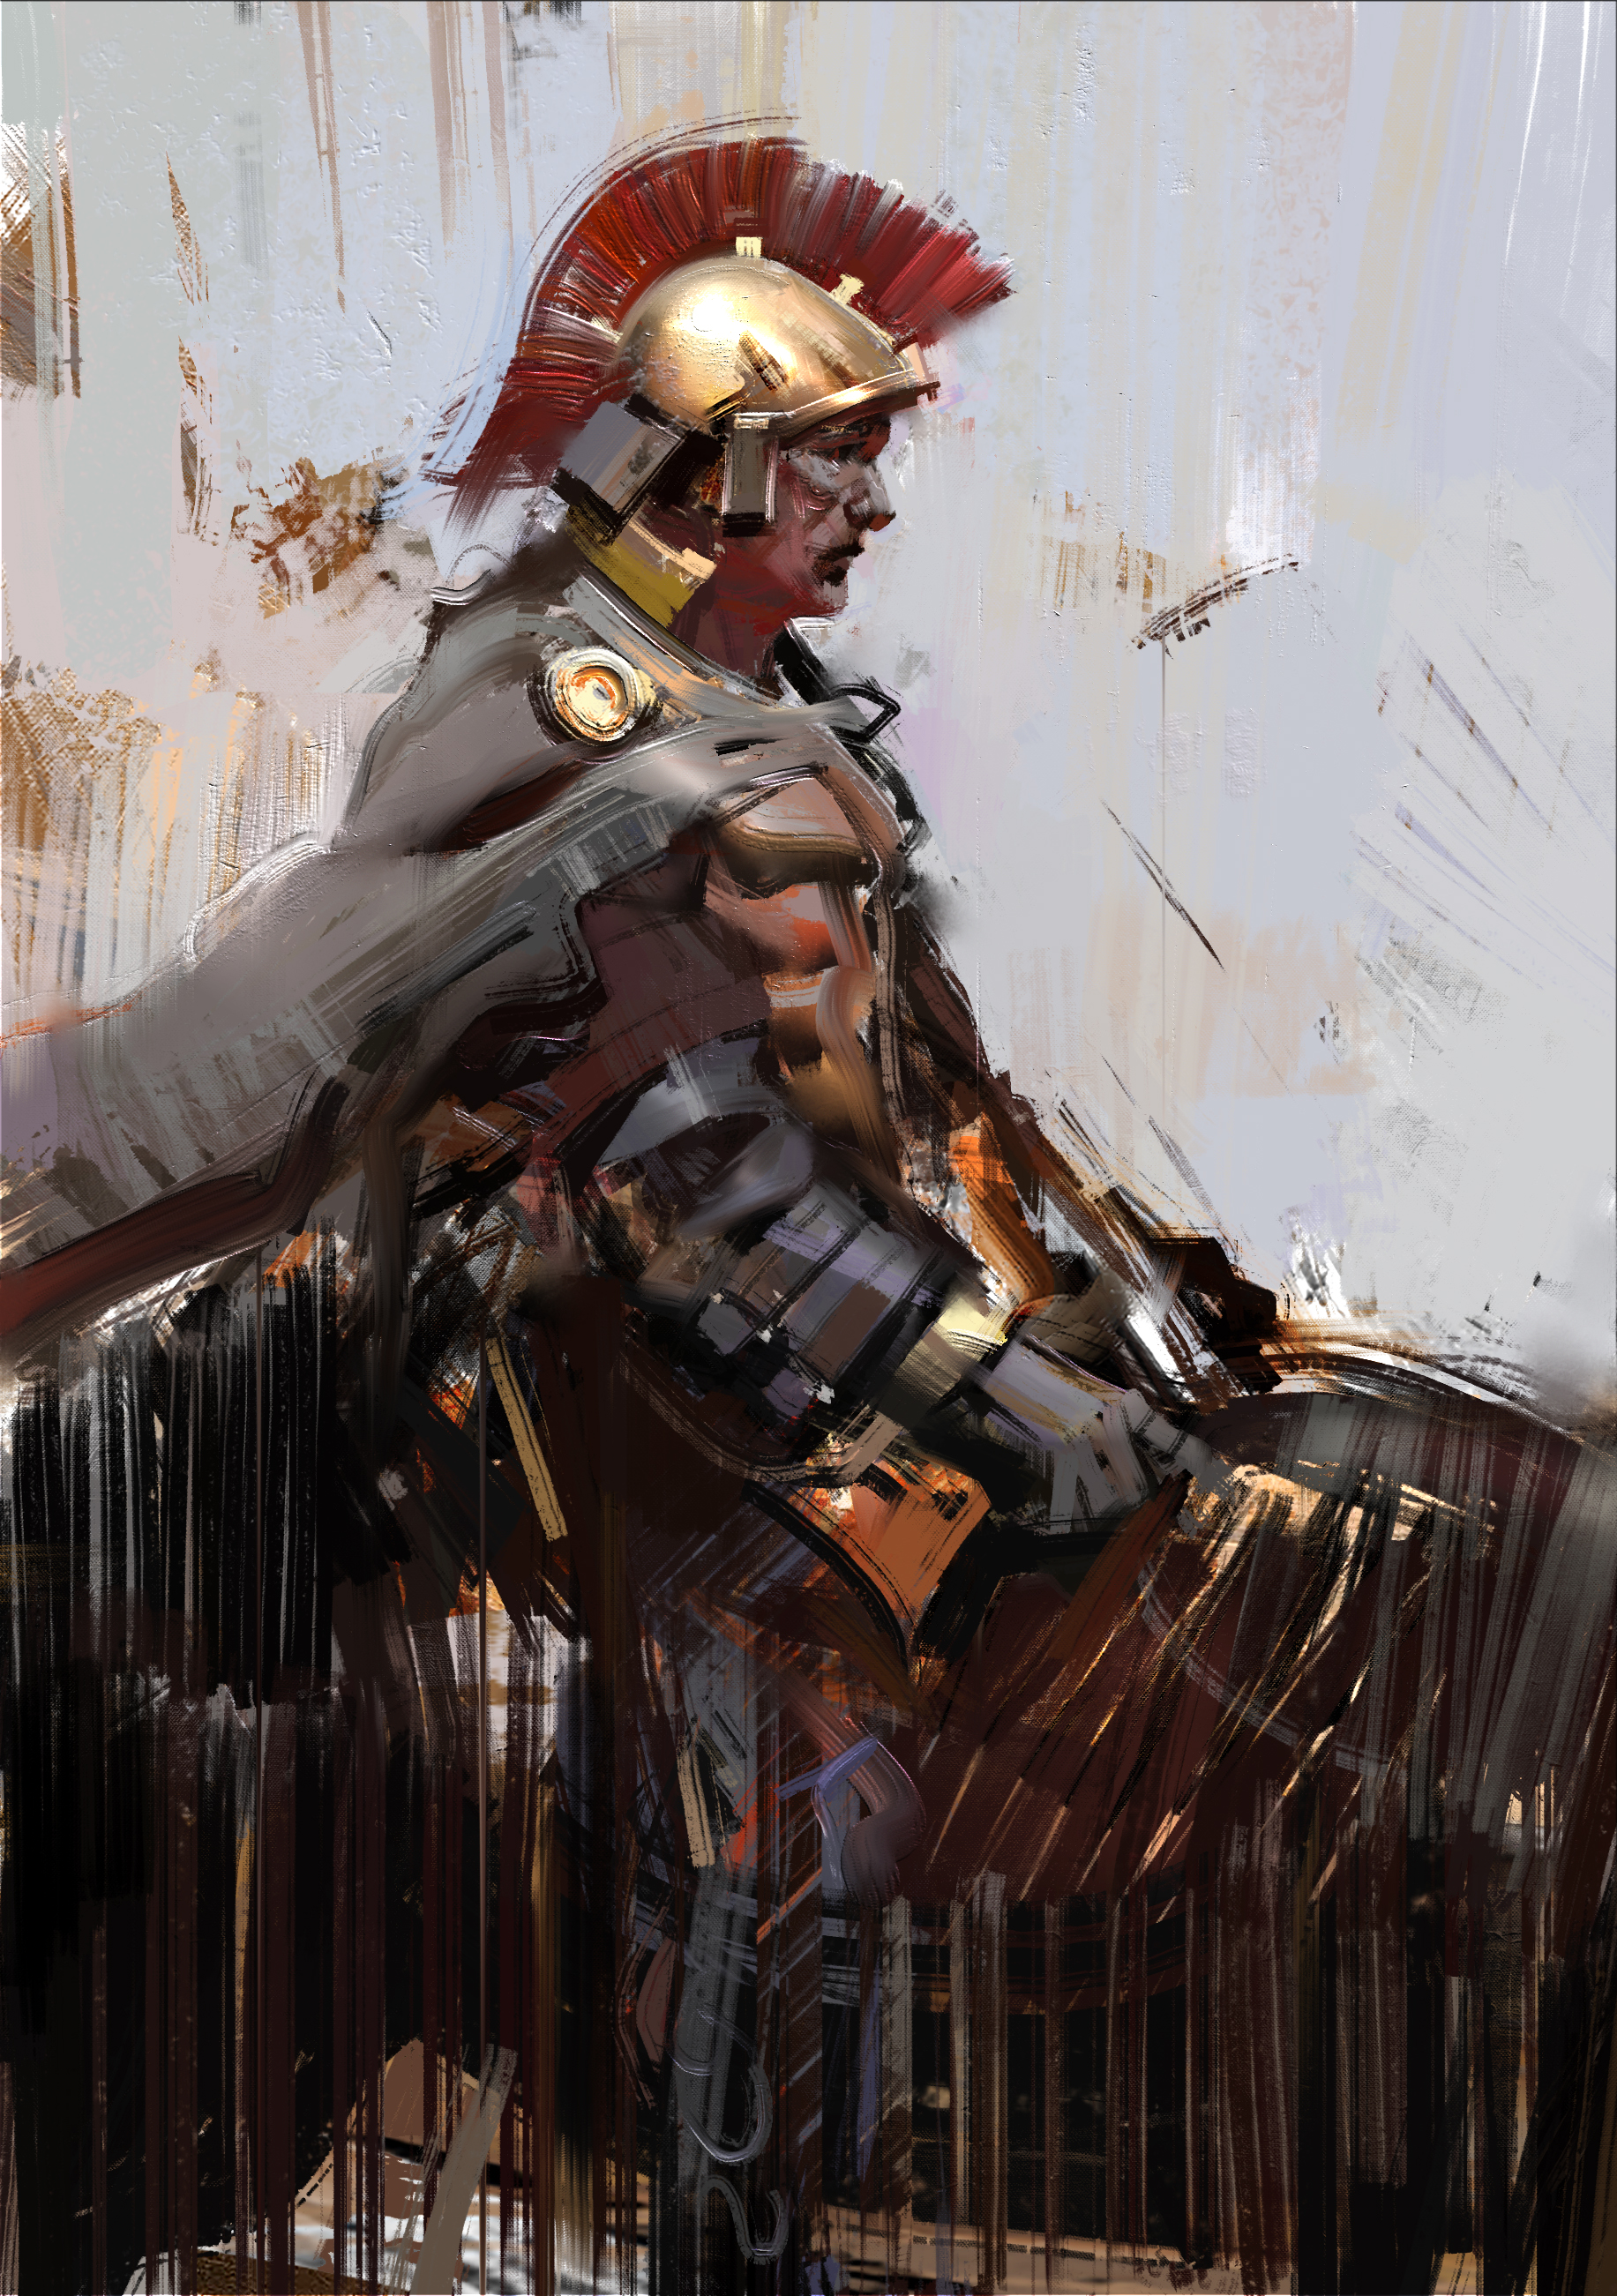 Galeria de Arte: Ficção & Fantasia 1 - Página 6 Roman_soldier_by_jamajurabaev-d7va7as